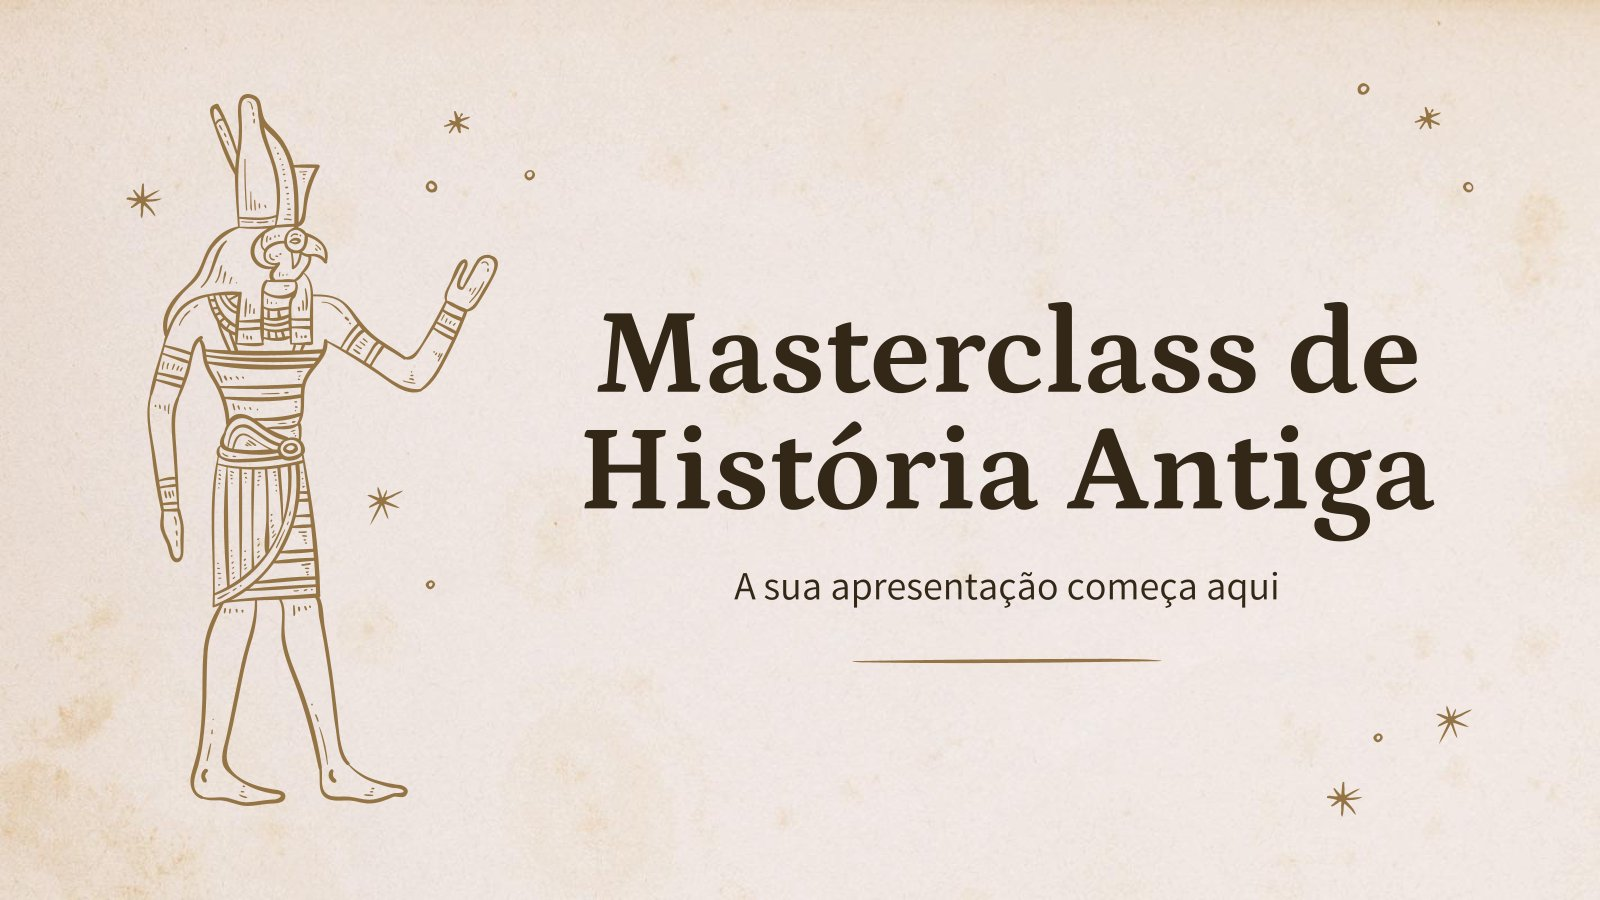 Masterclass de História Antiga : Modèles de présentation